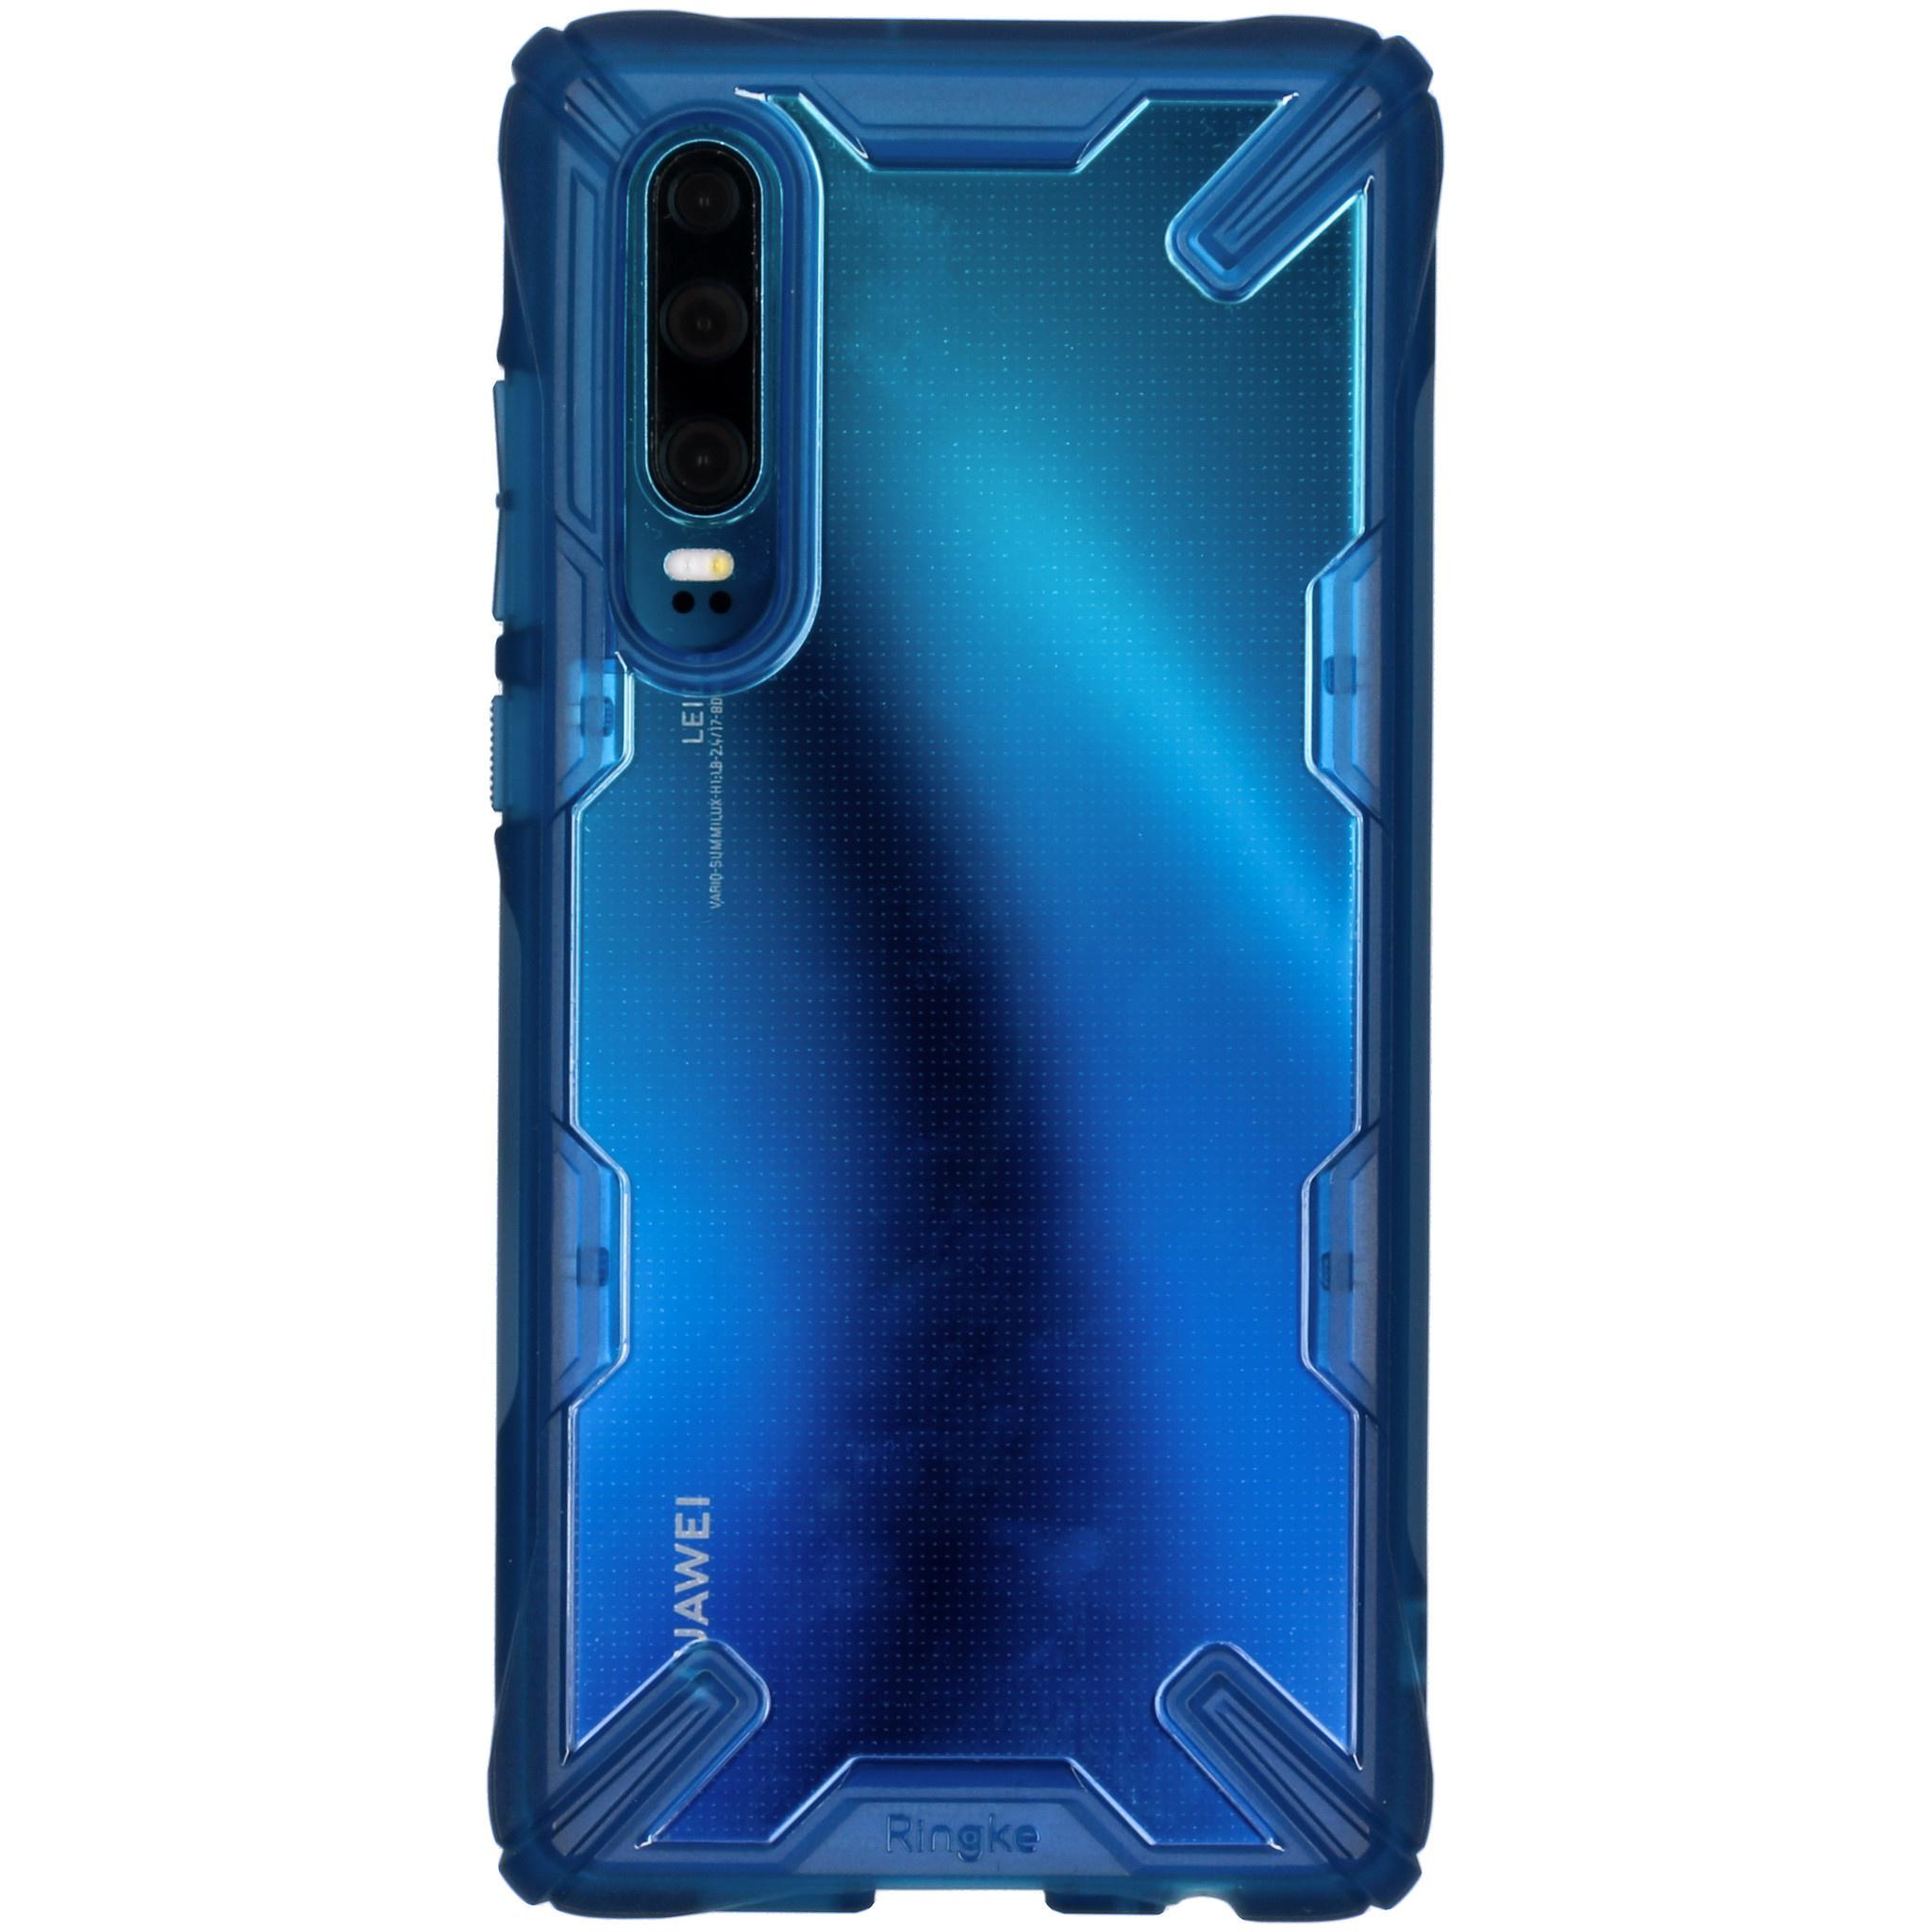 Ringke Coque Fusion X pour l'Huawei P30 - Bleu